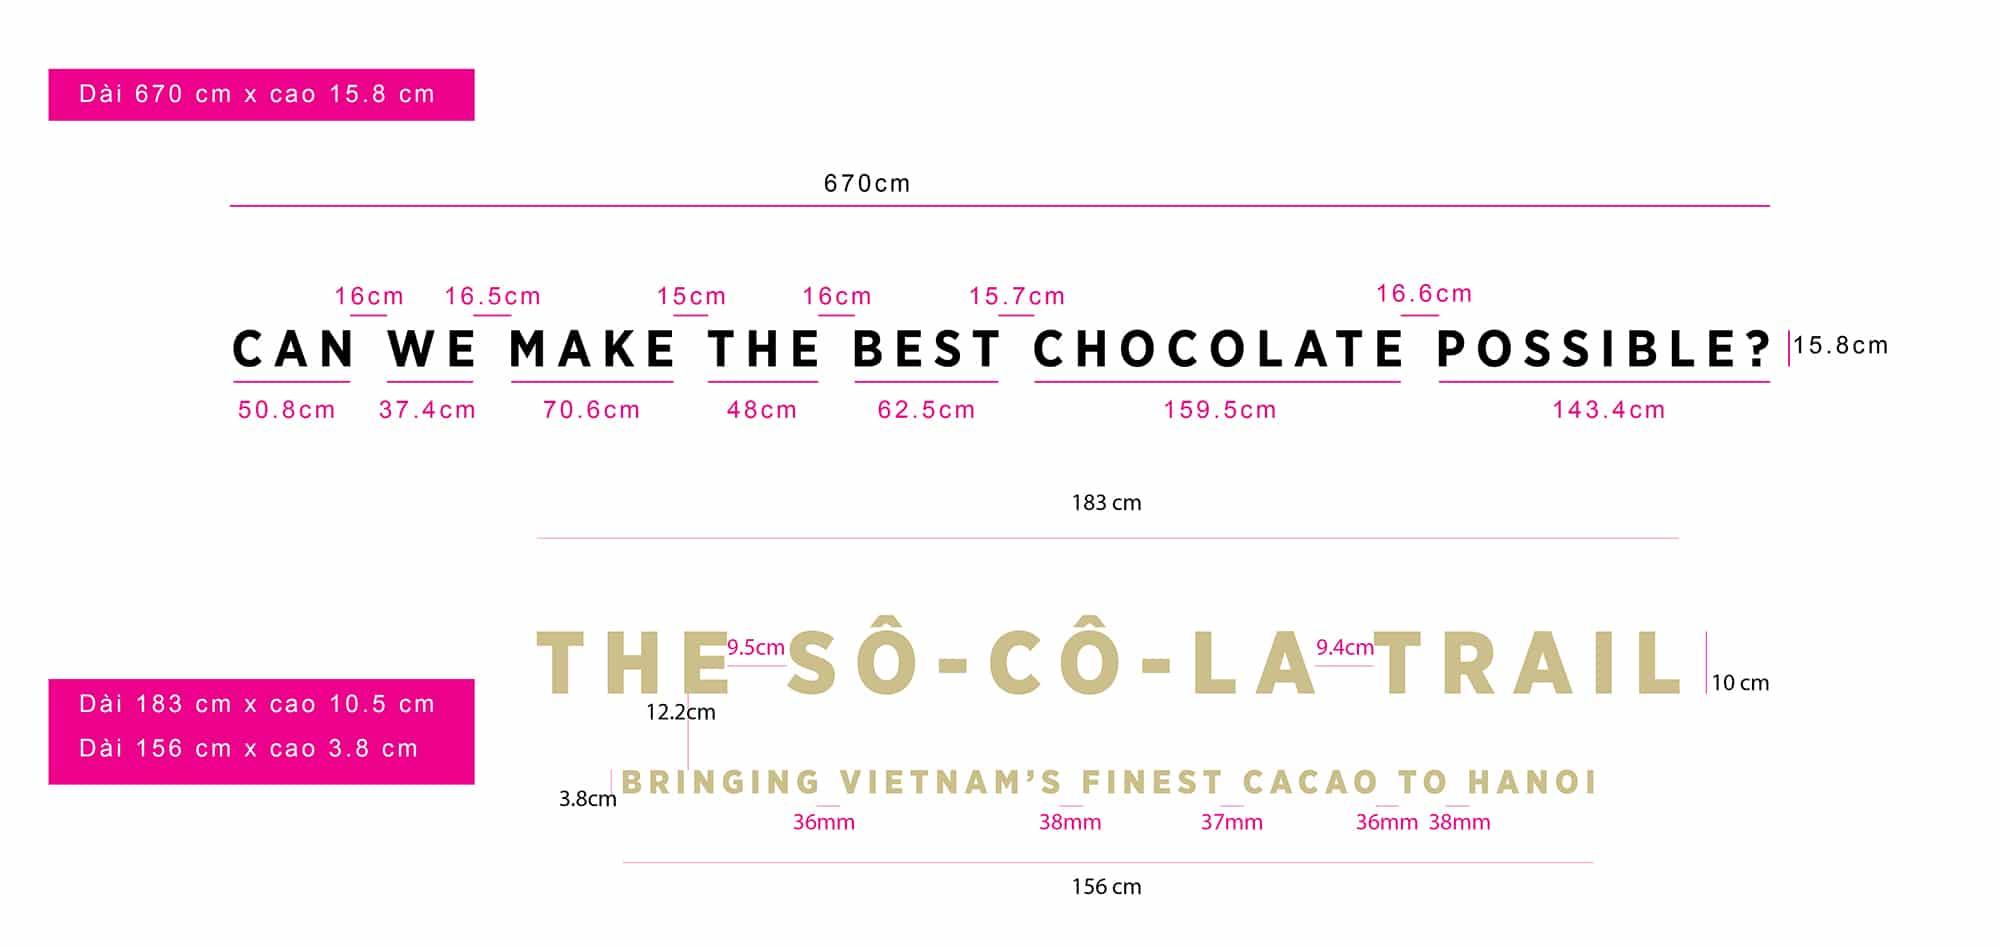 Chocolate ngon nhất thế giới - Maison Marou Hanoi 2